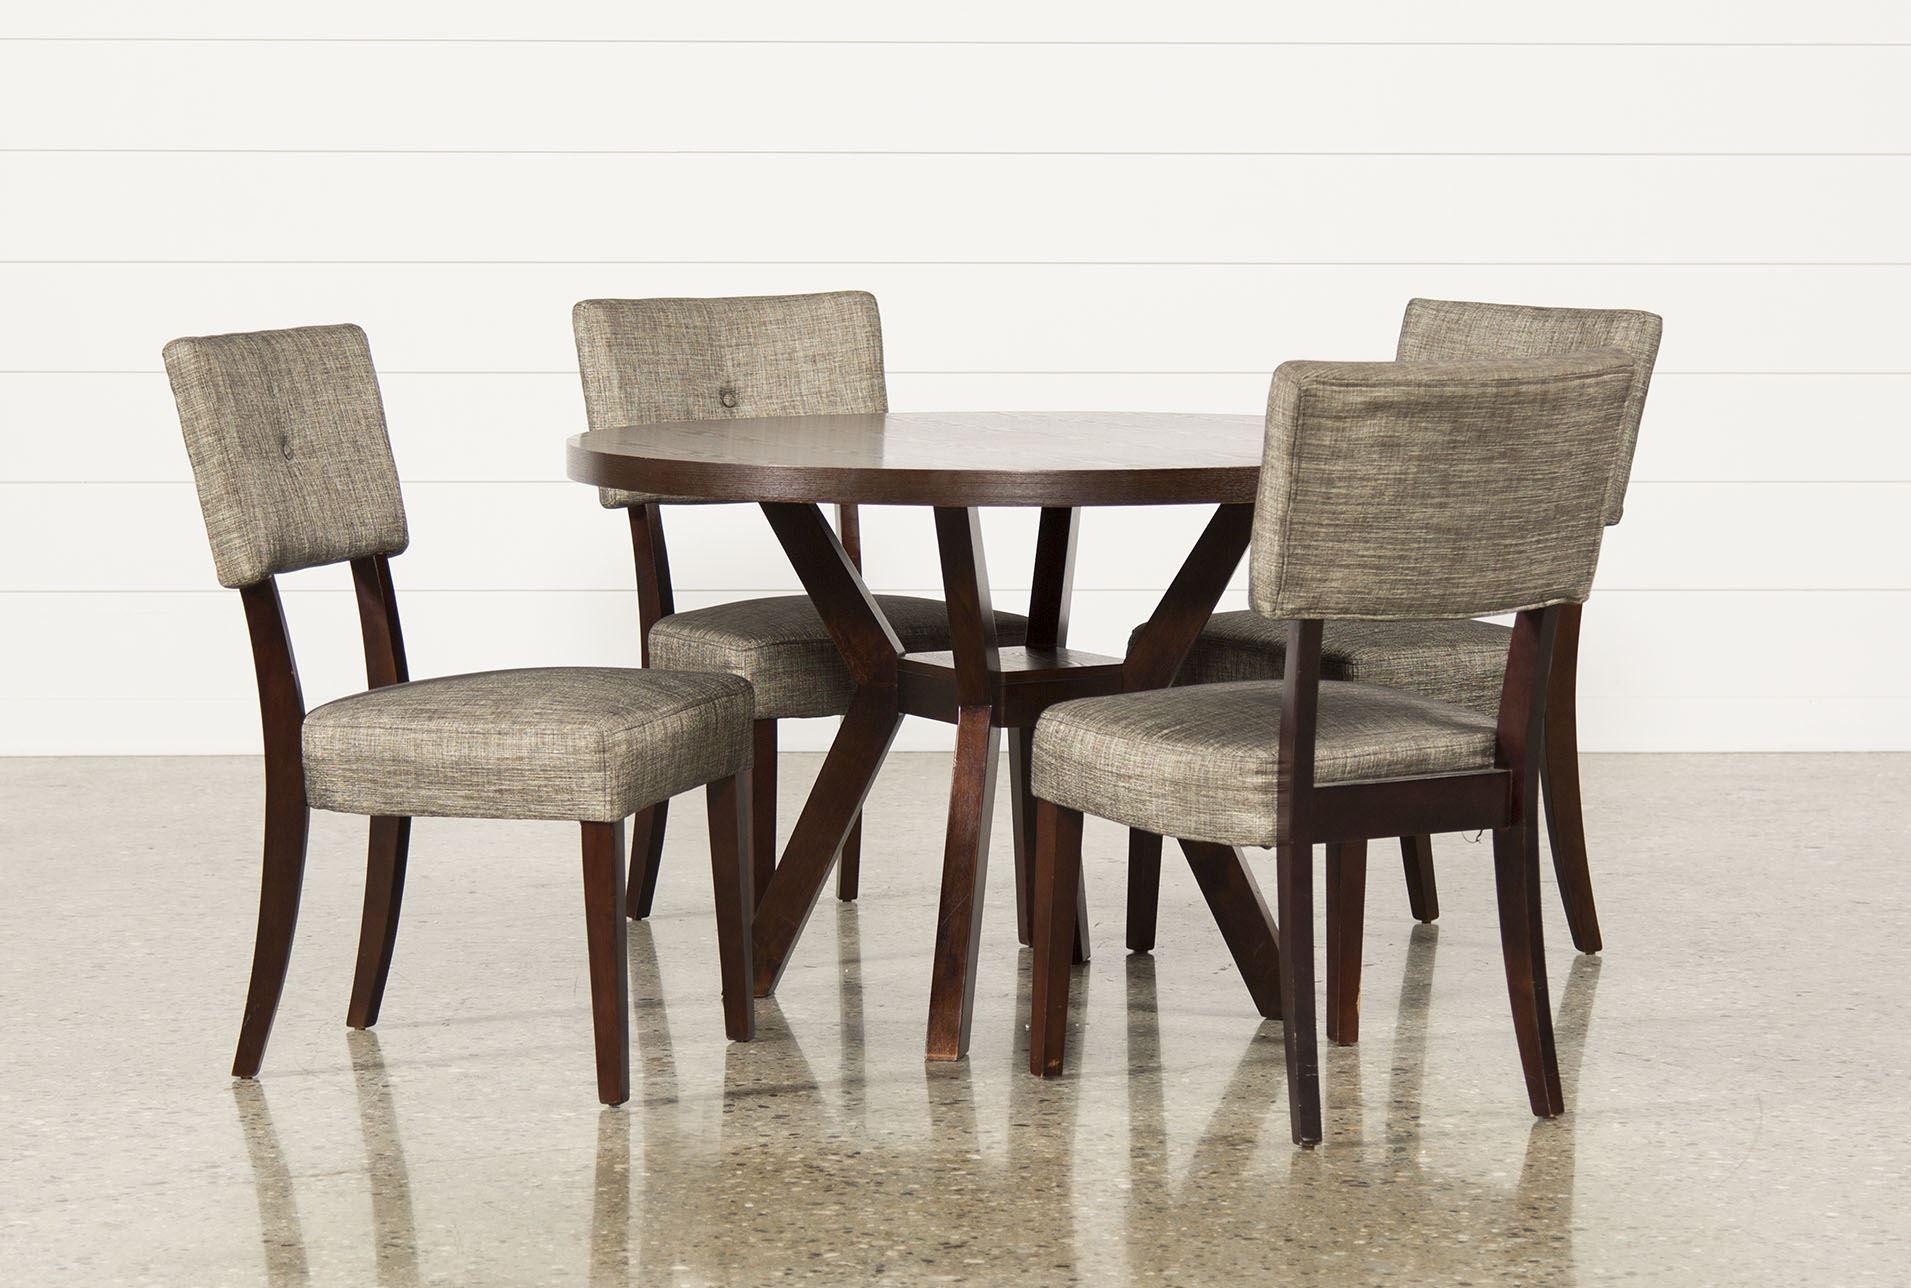 Macie 5 Piece Round Dining Set - Living Spaces | Furniture ...